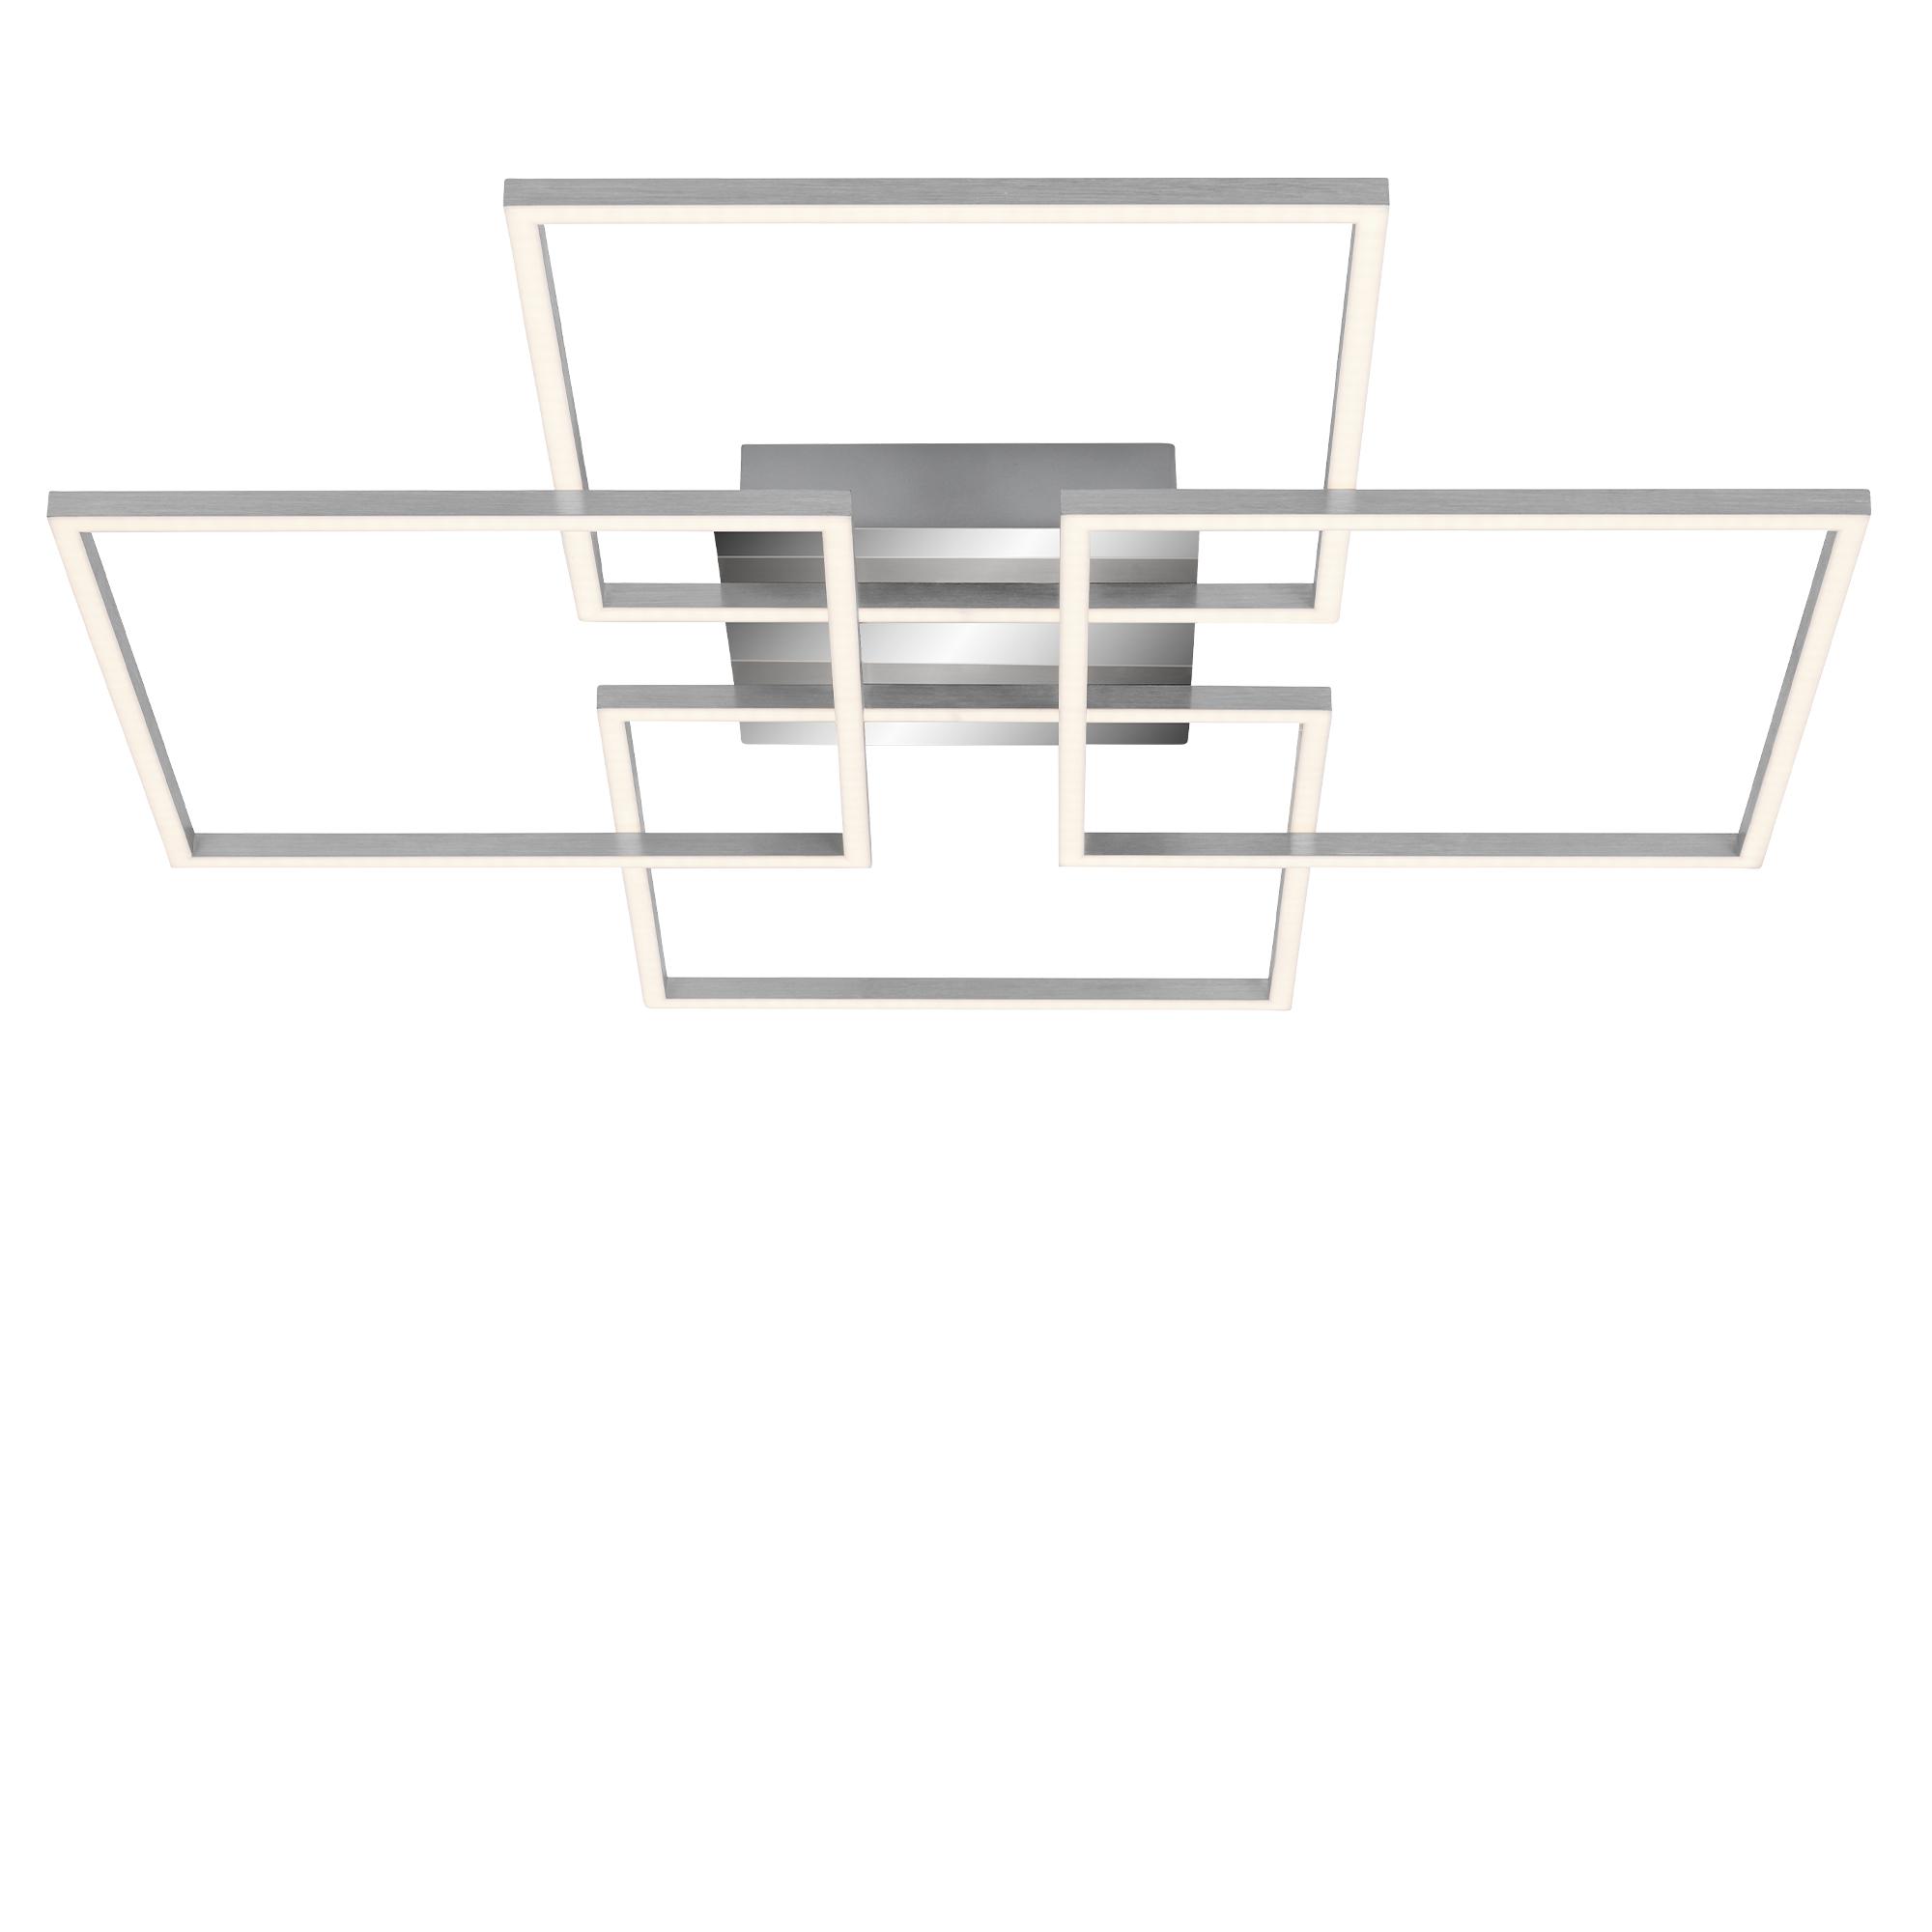 LED Wand- und Deckenleuchte, 72,4 cm, 57 W, Alu-Chrom